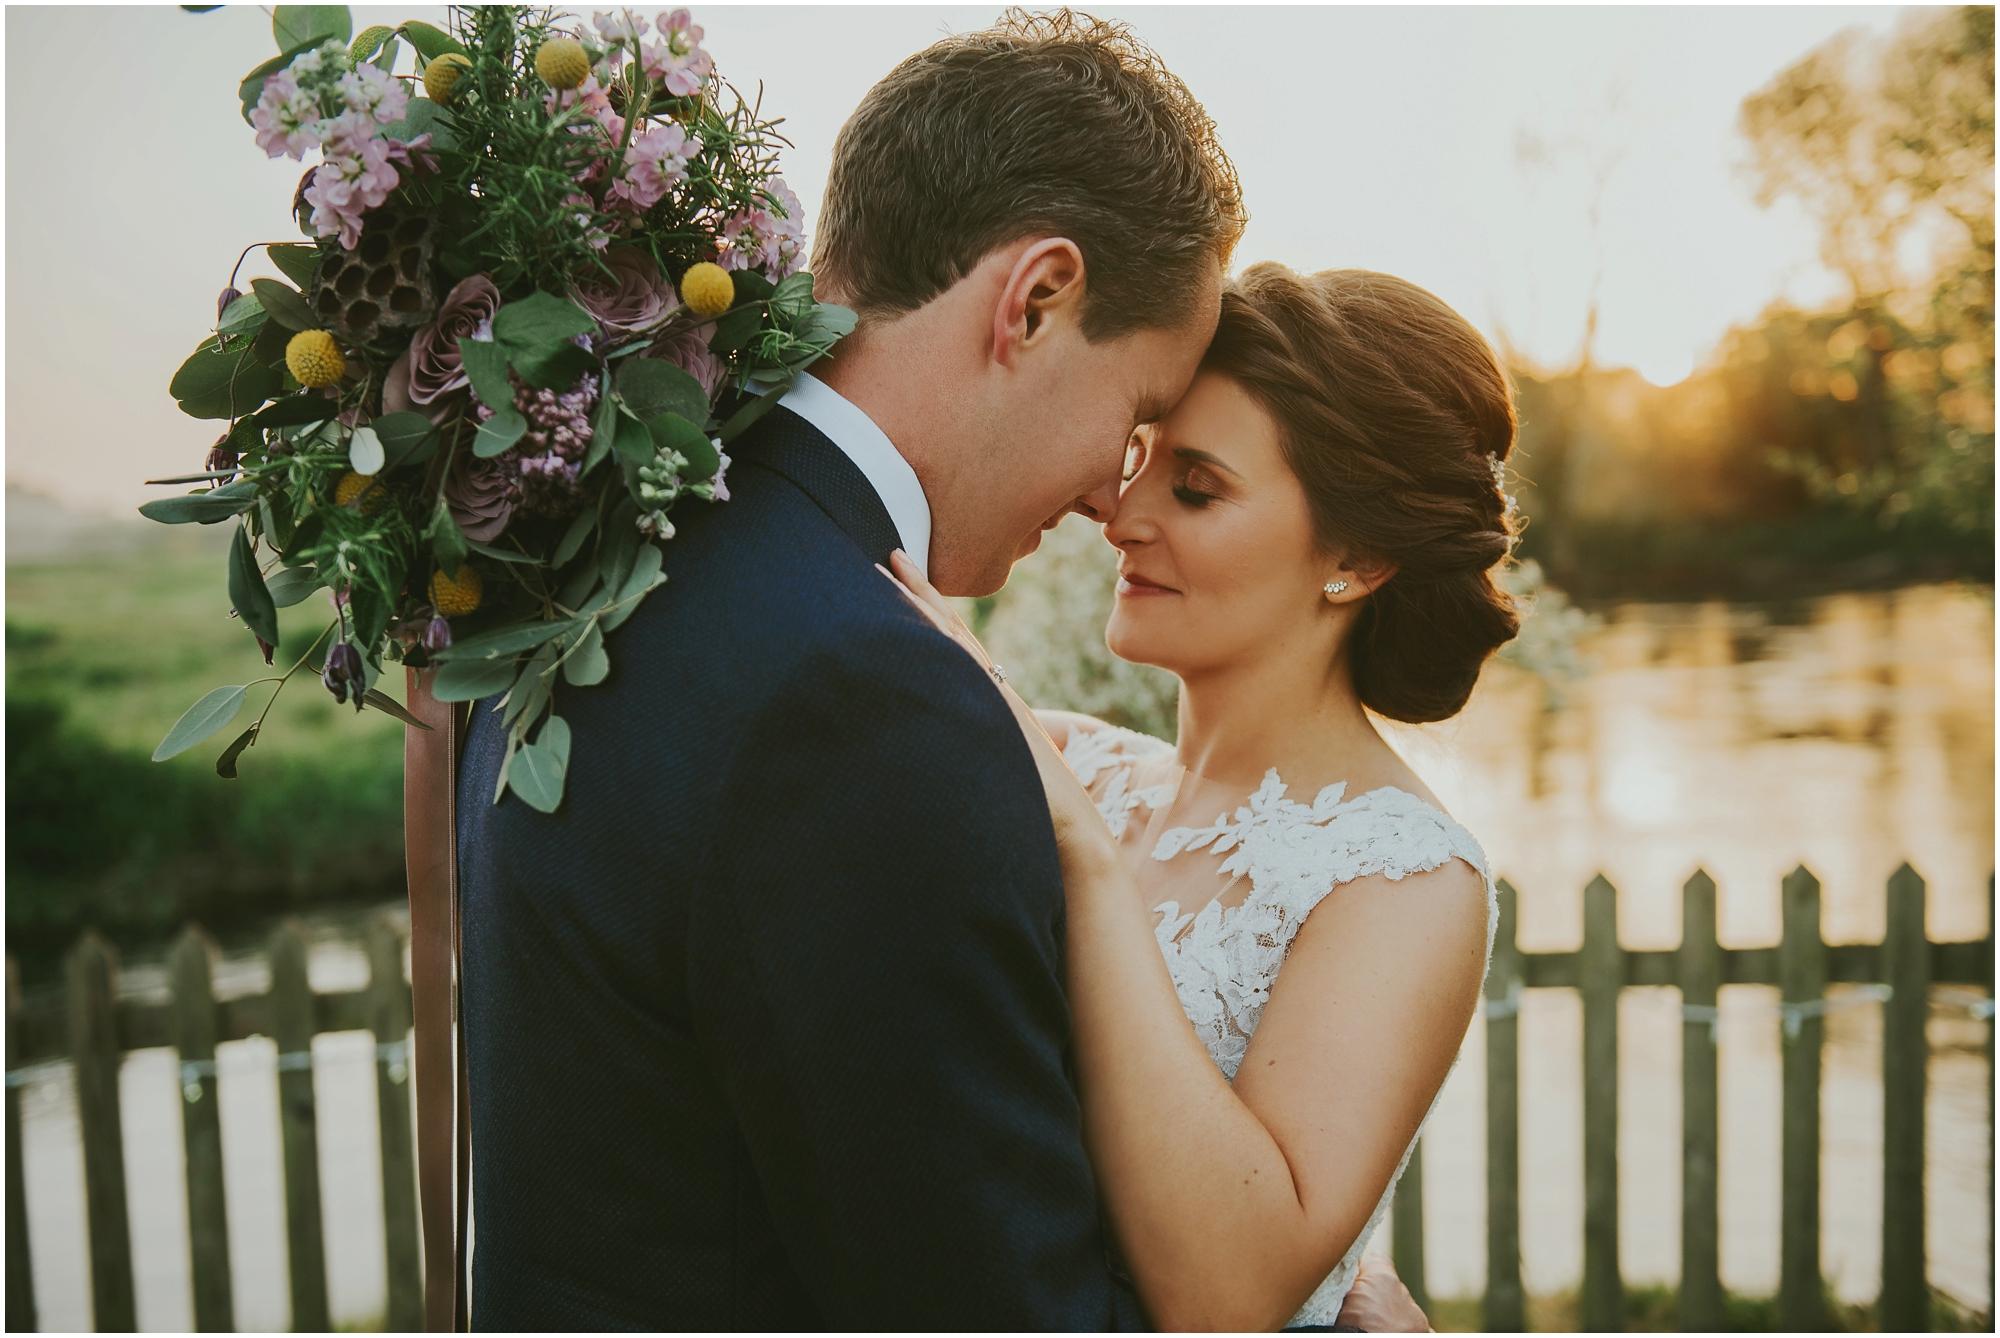 Sopley_Mill_Wedding_SamanthaDavisPhotography029.jpg